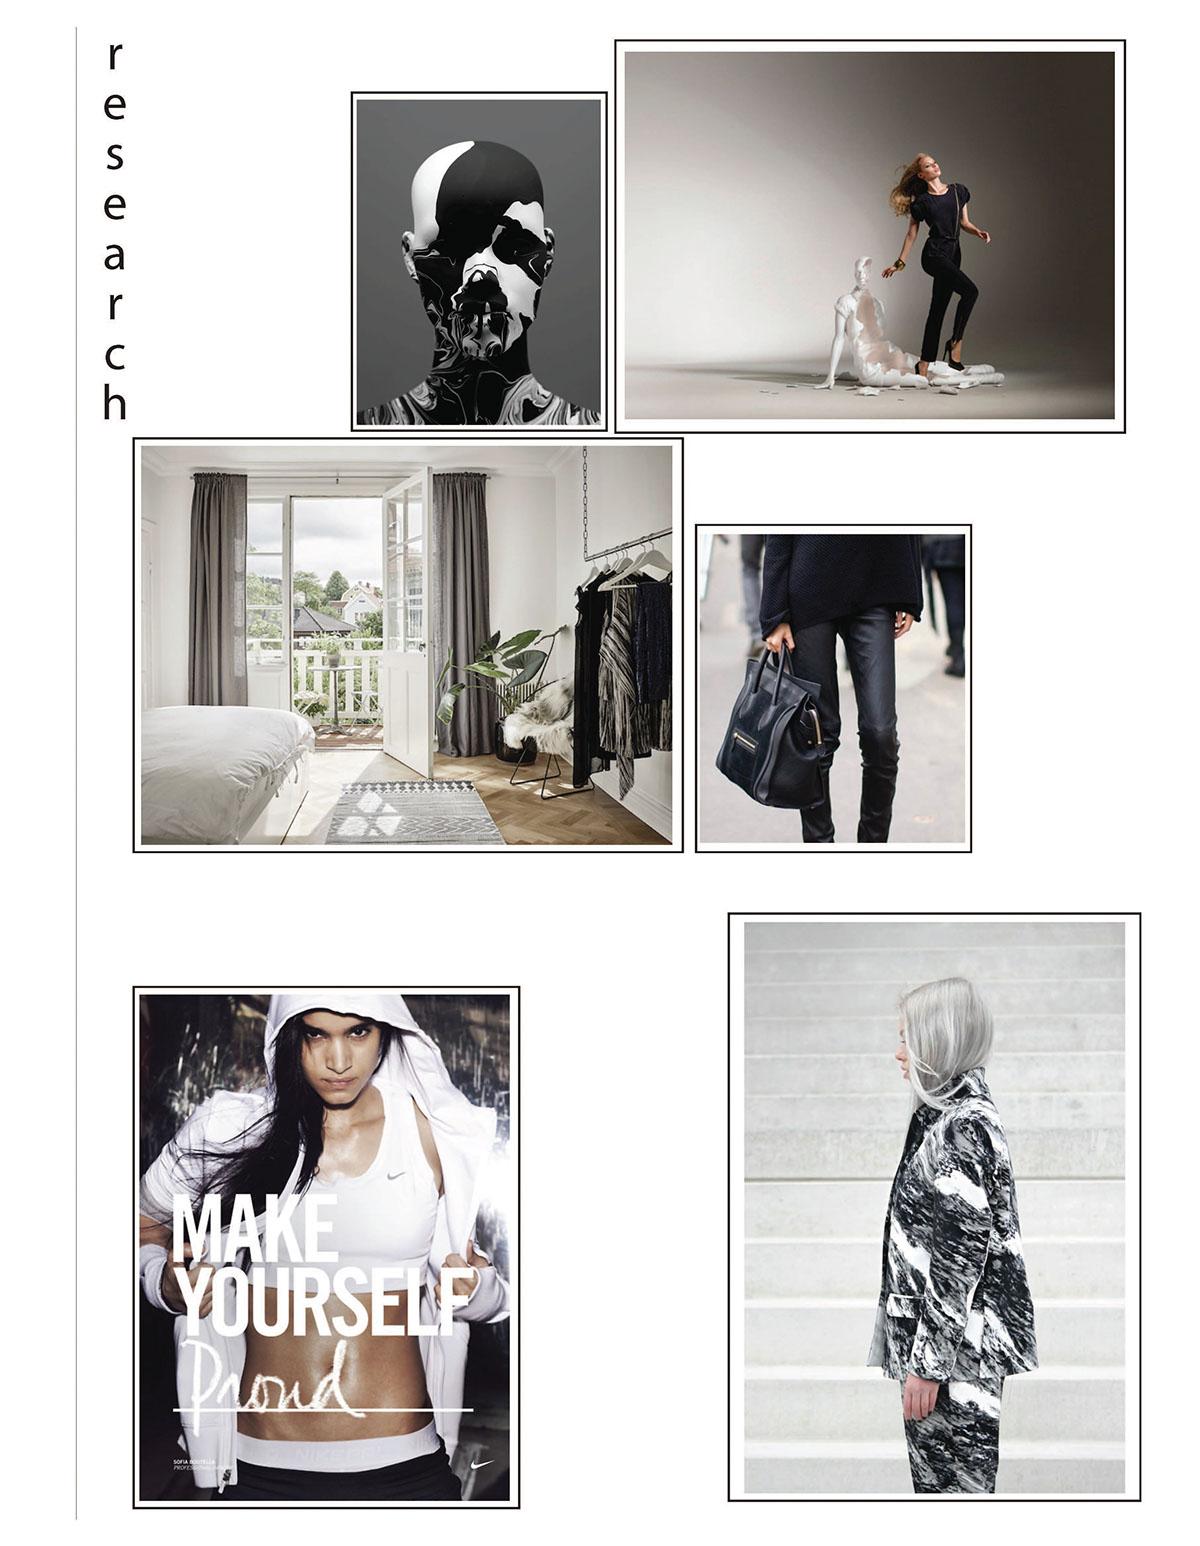 Senior Collection accessories accessory design collection footwear collection handbags shoes bags Marble Coexistence